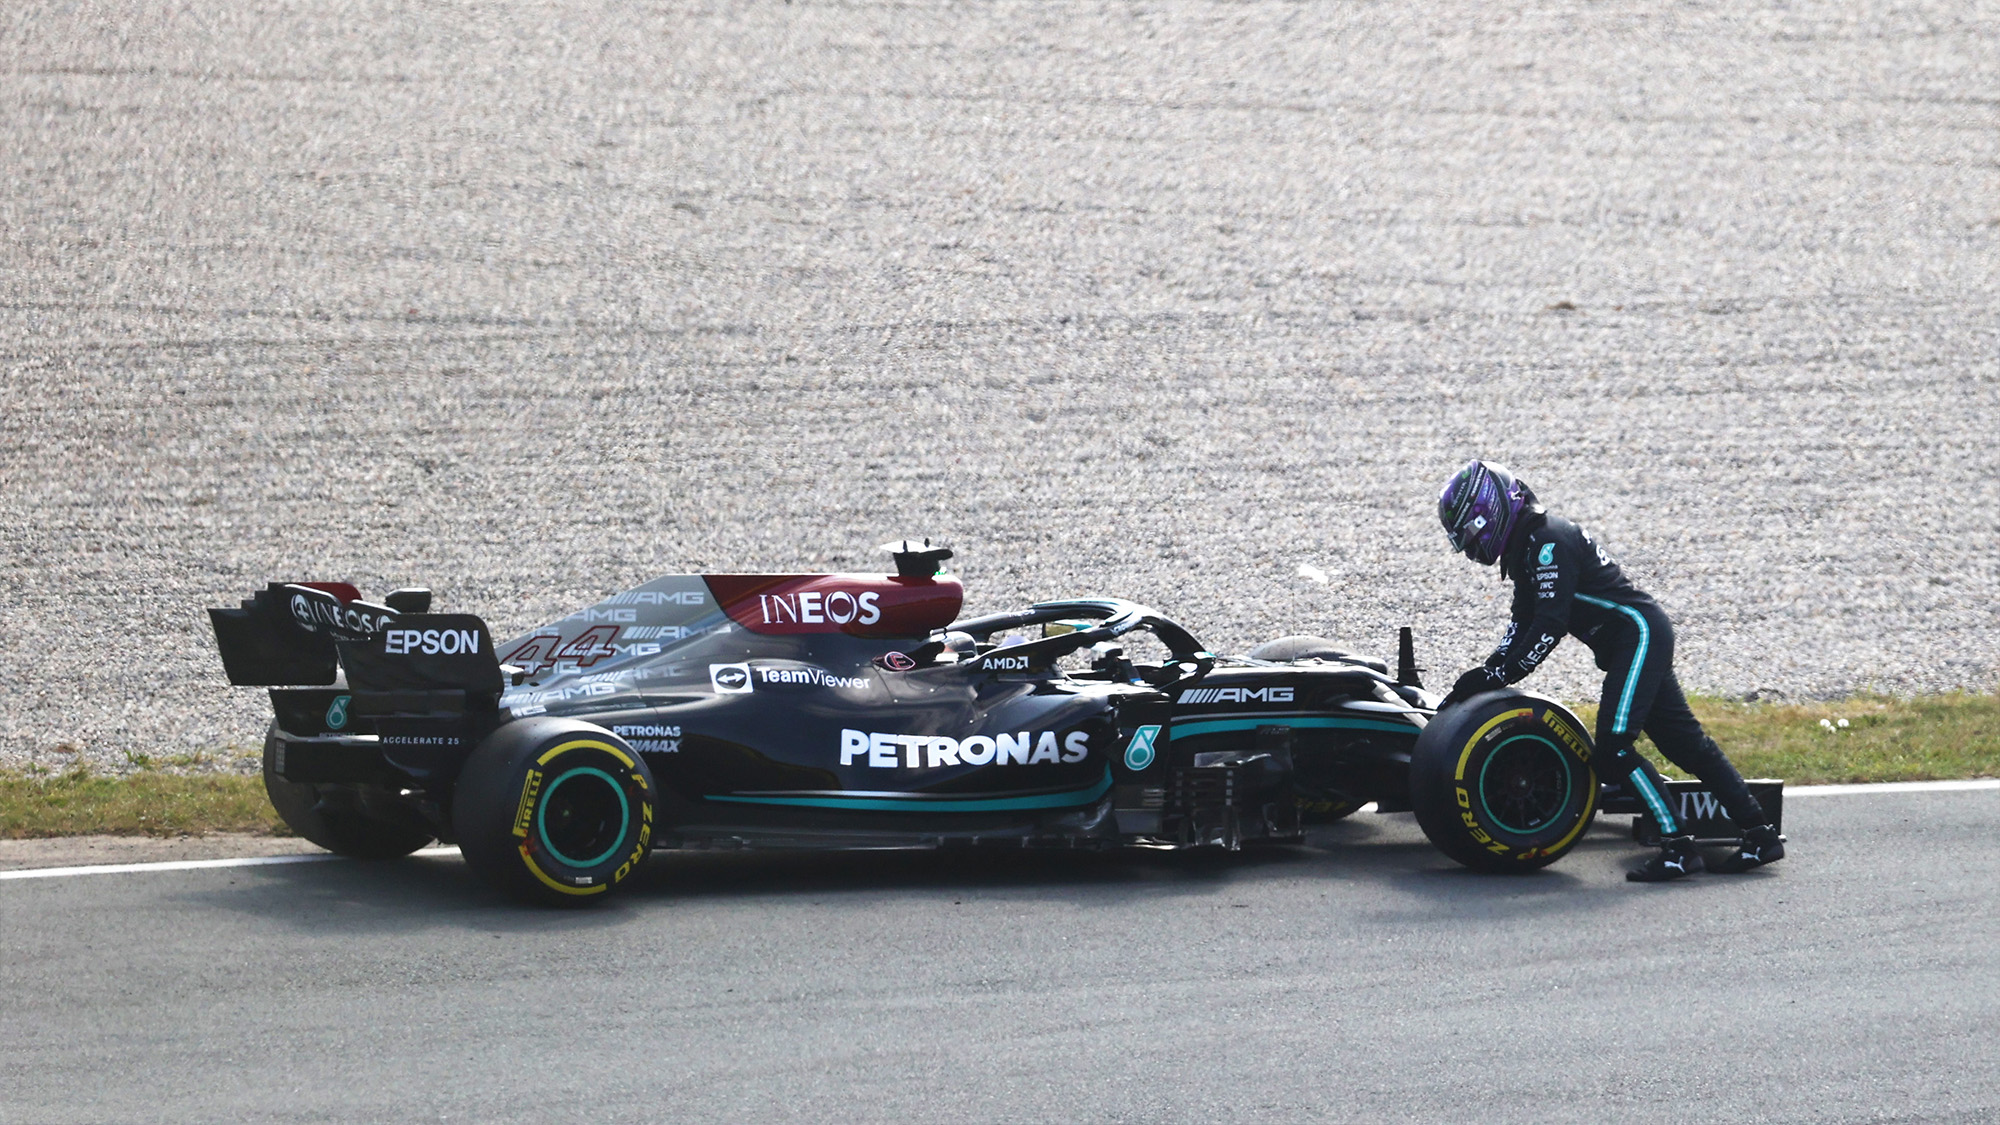 Lewis Hamilton stops on track at Zandvoort